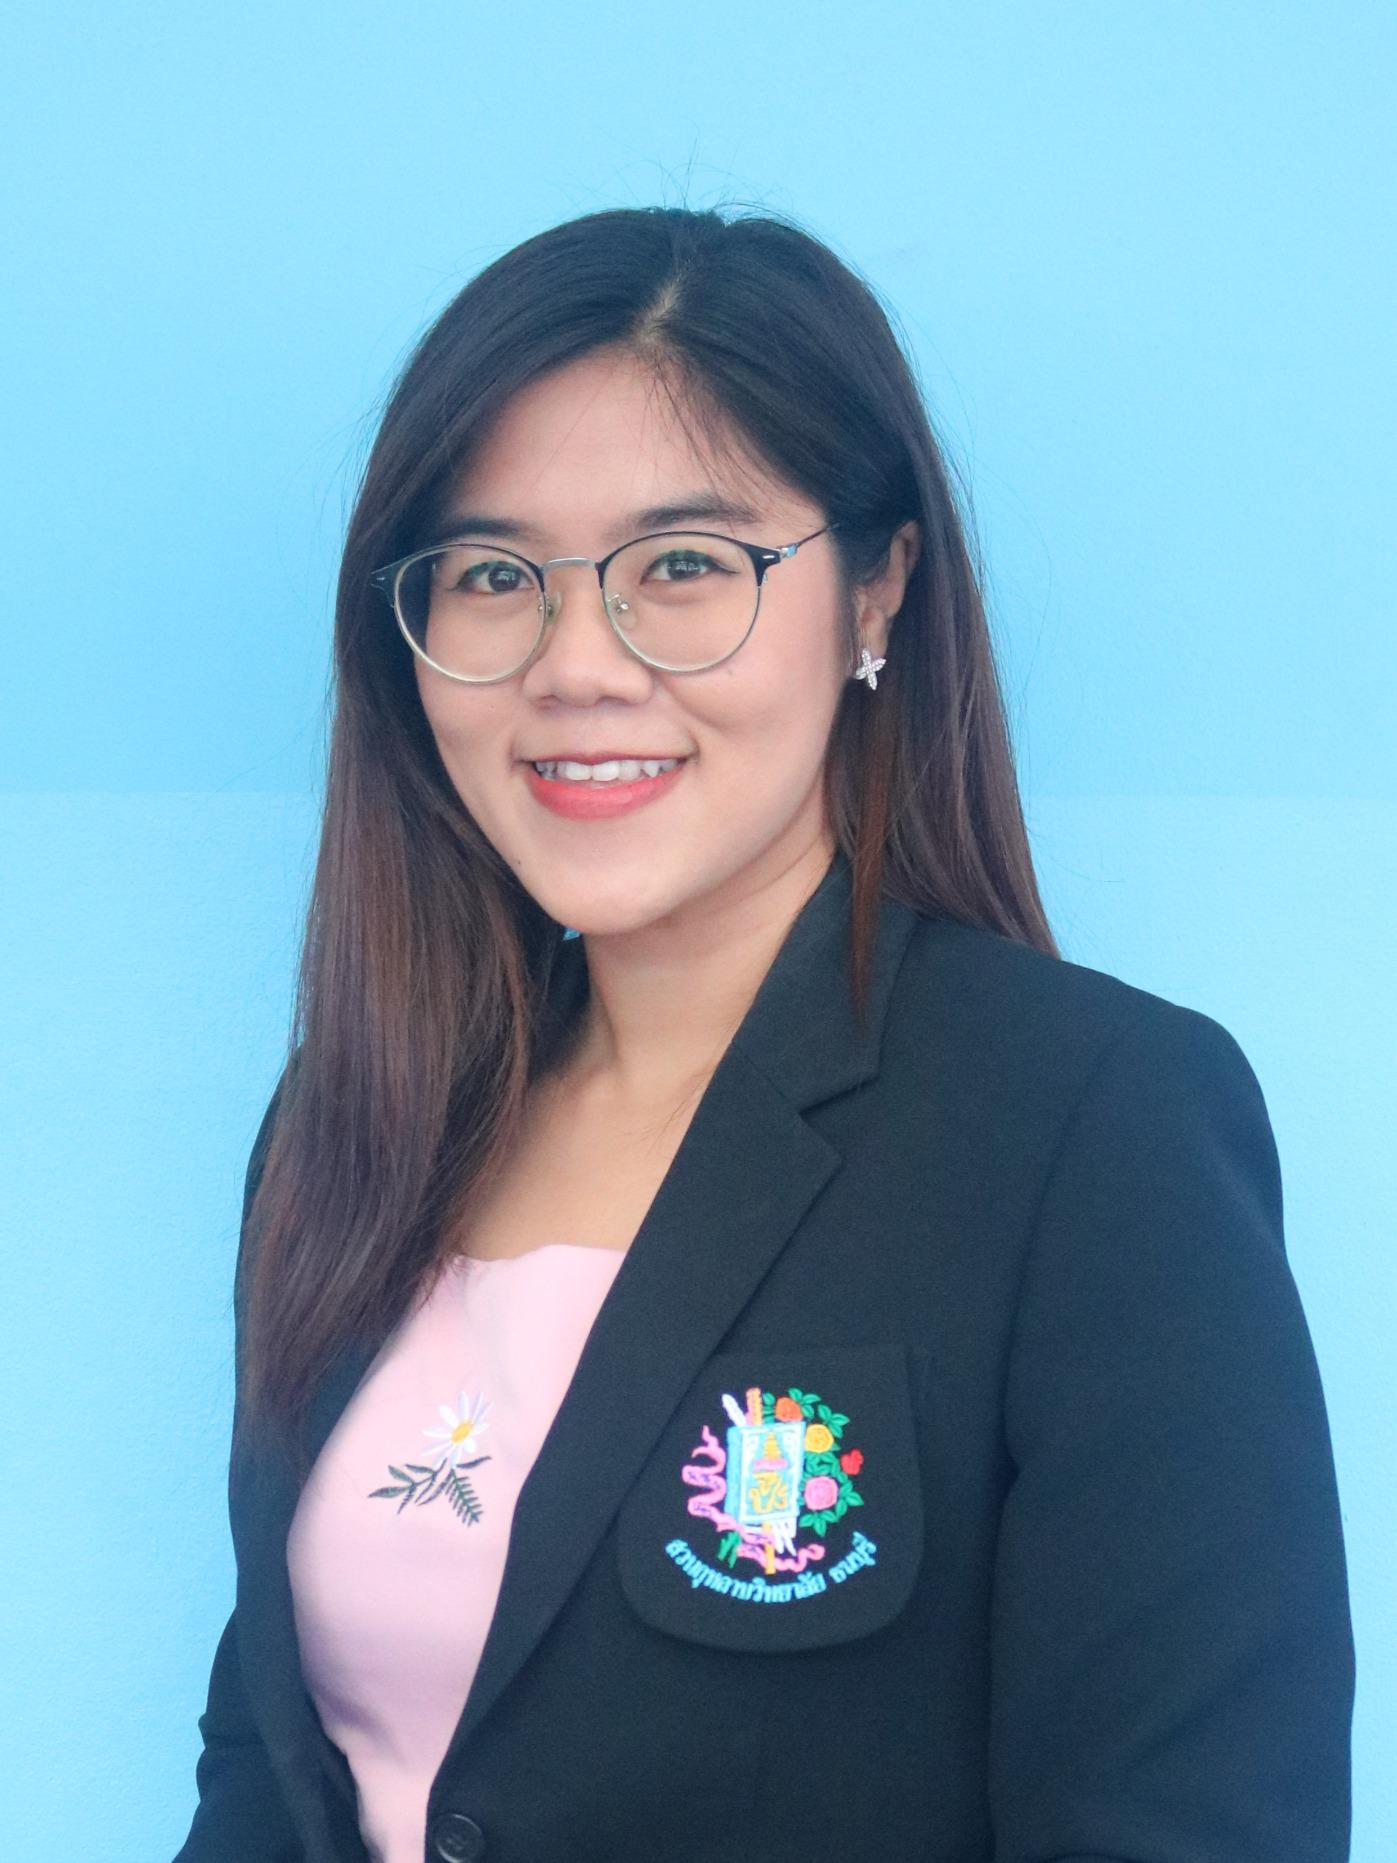 Ms. Pussadee Yangklan